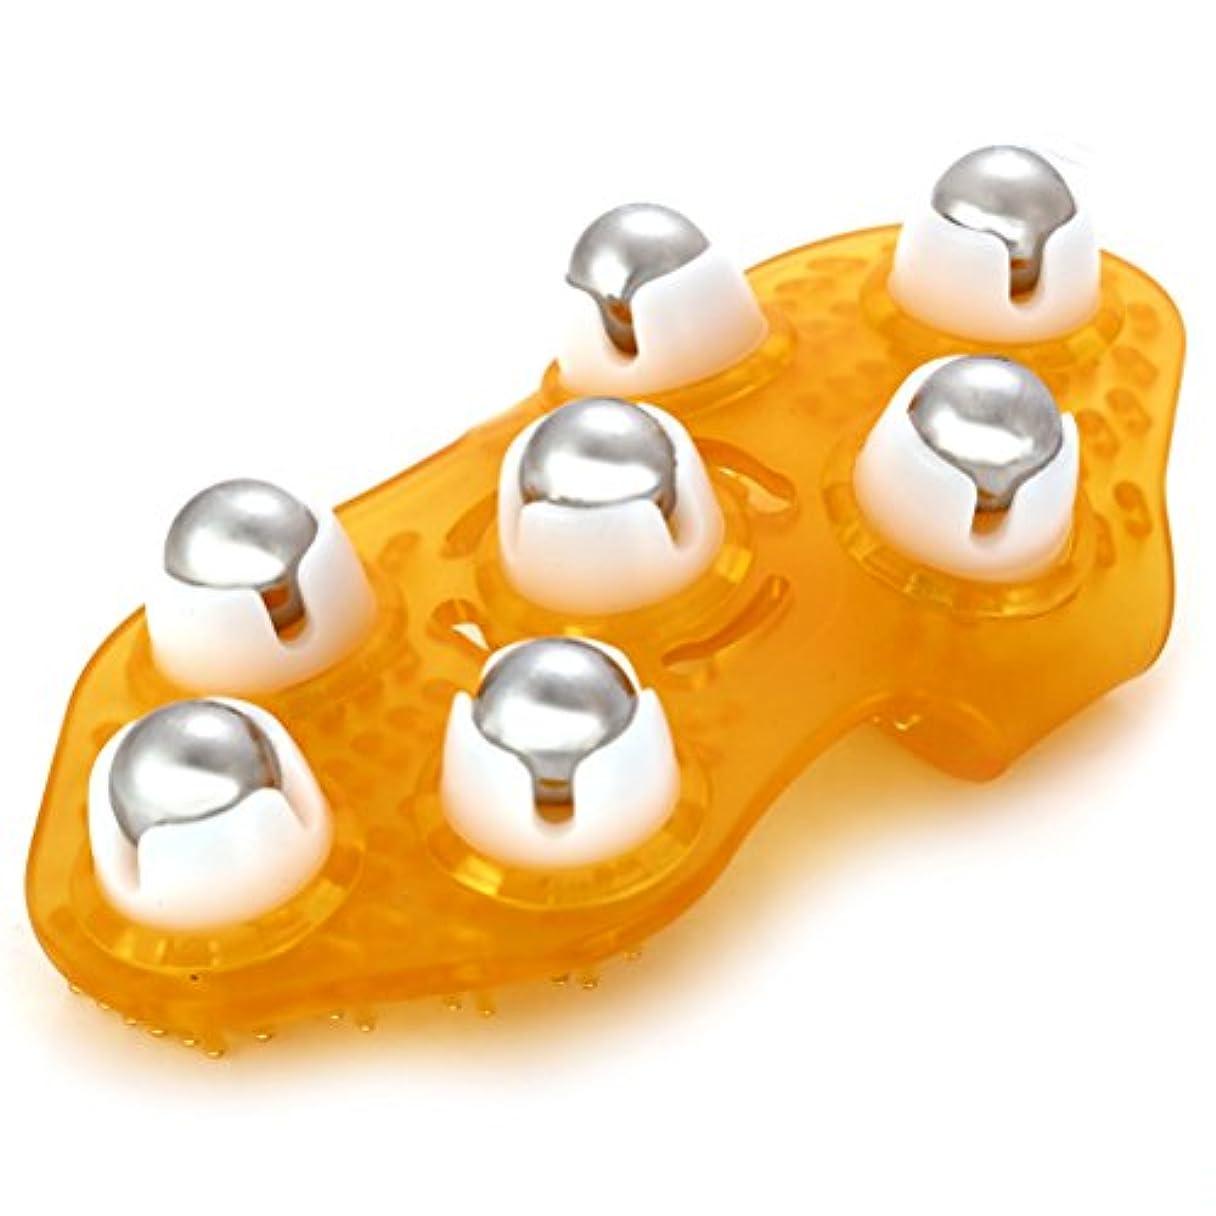 ROSENICE マッサージグローブ ボディ用 多機能マッサージ器具 360度鋼ローリングボール(ランダムカラー)